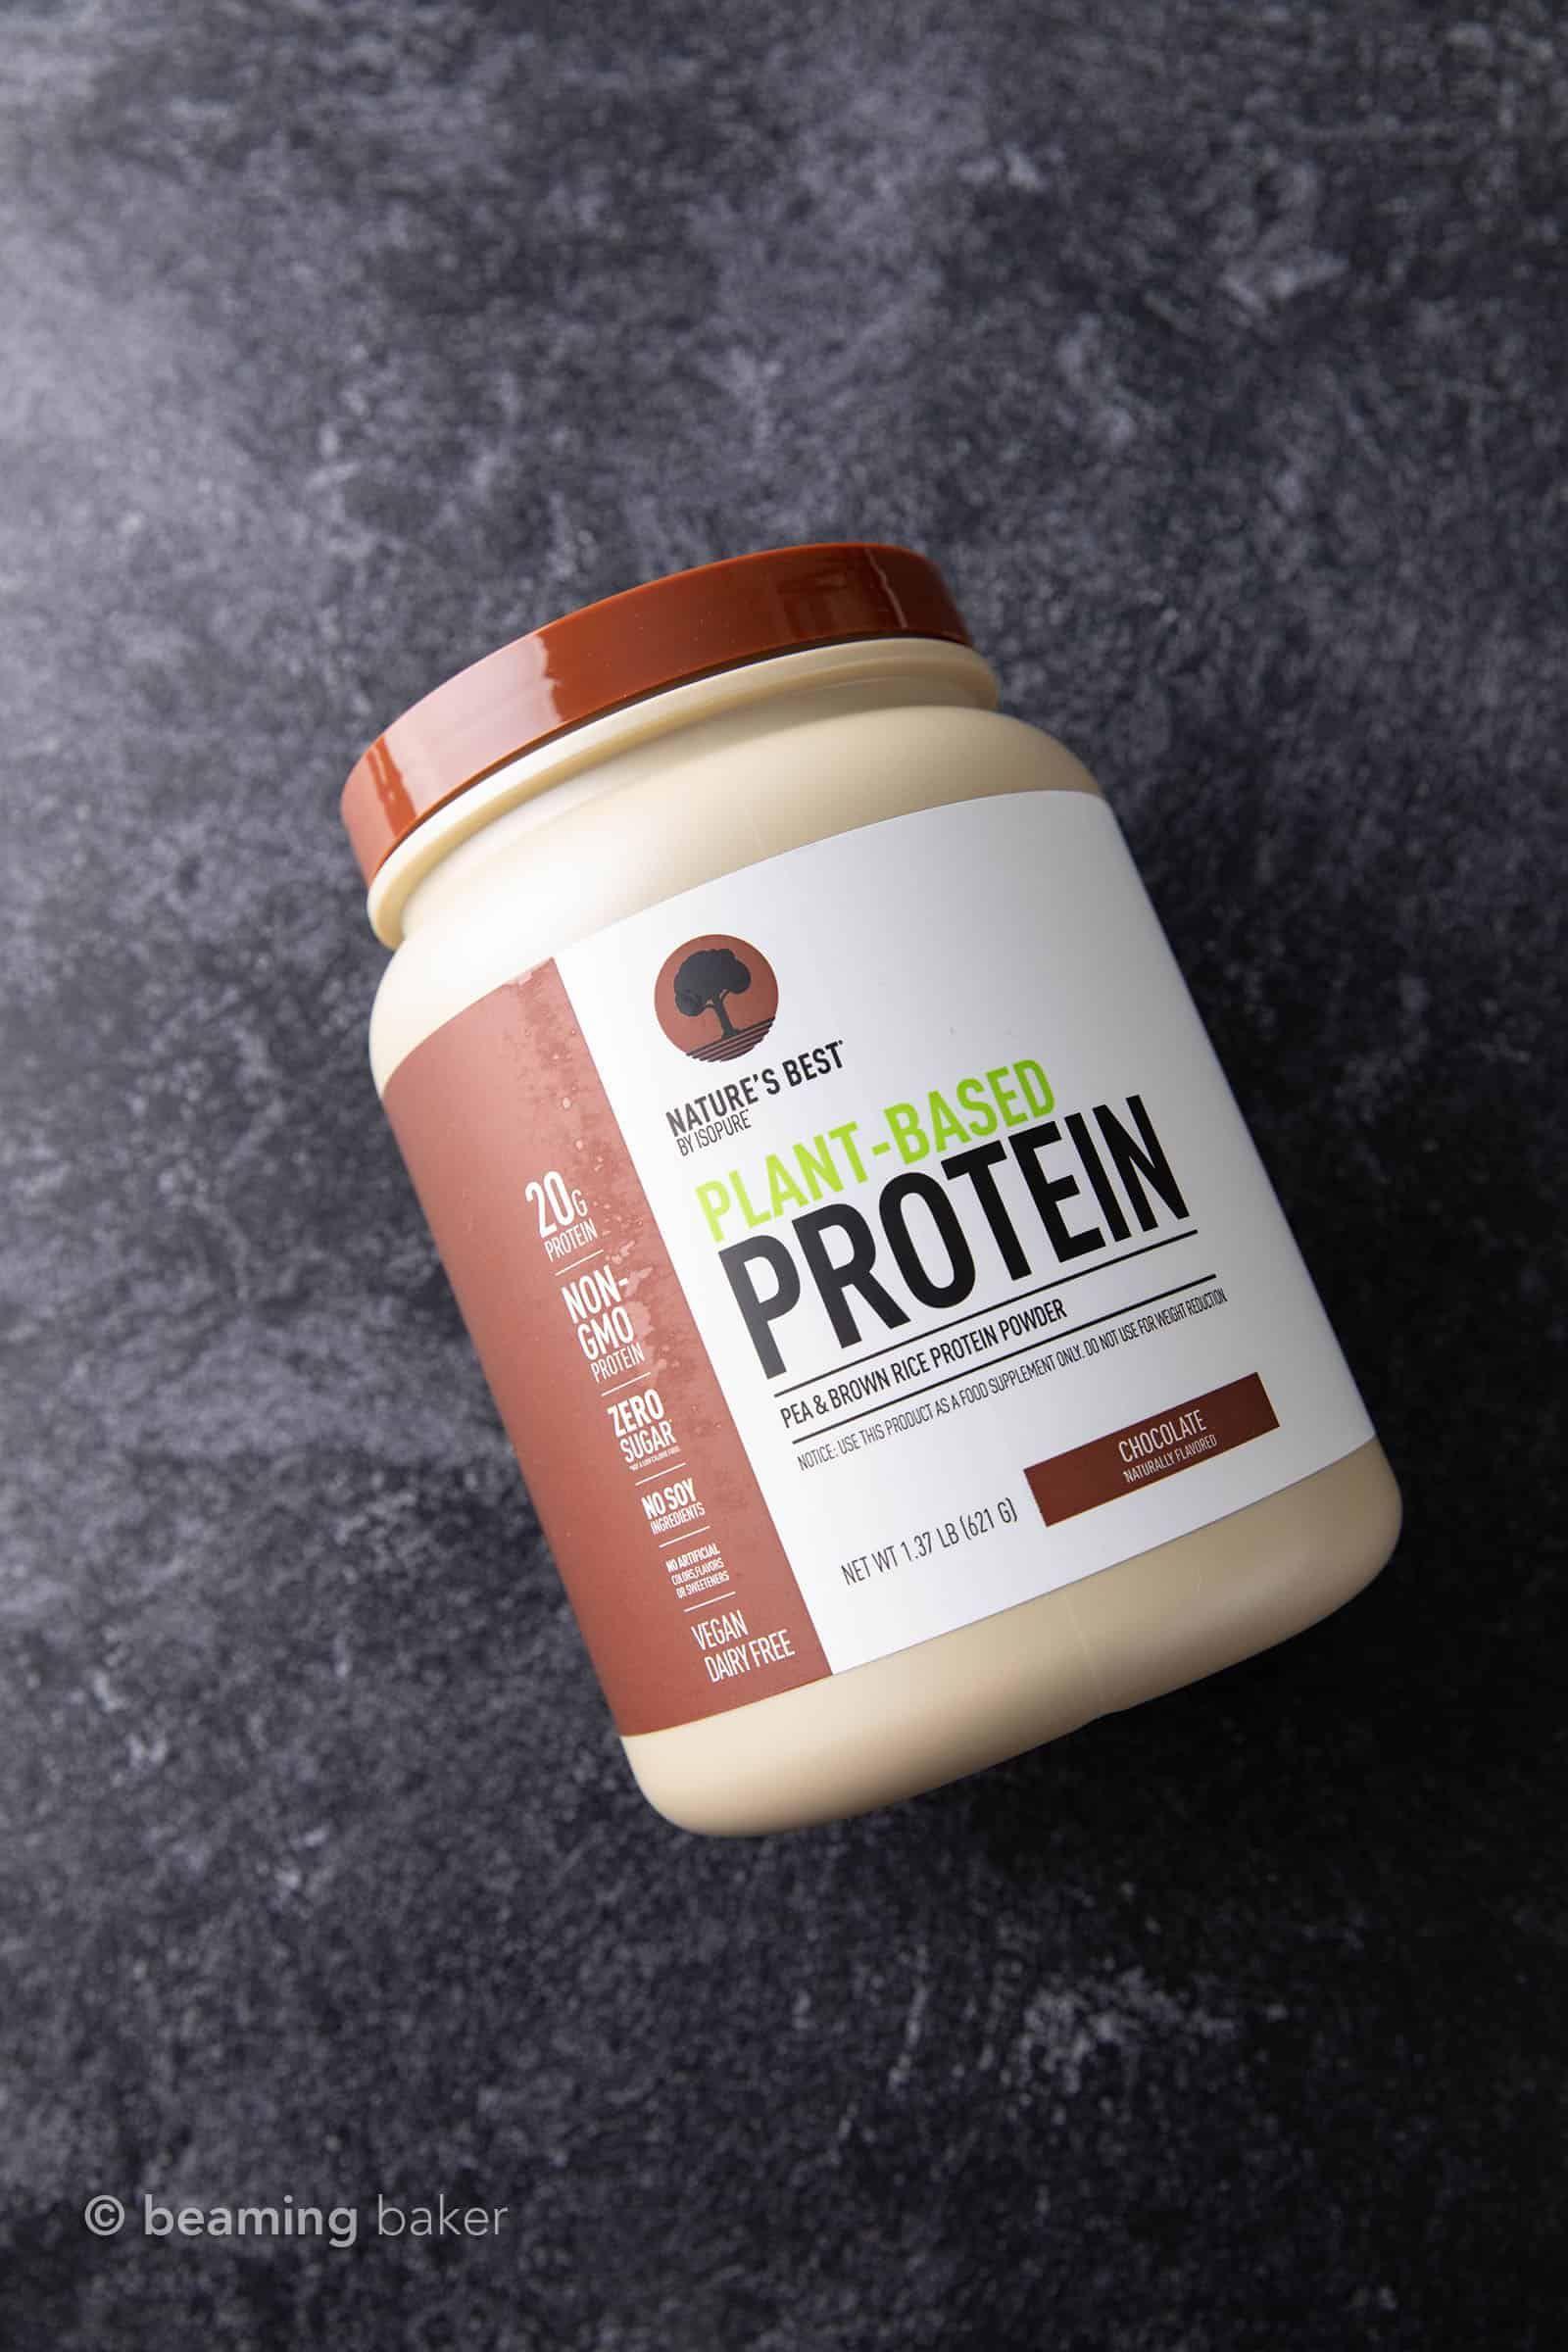 Best Vegan Protein Powder Ranked Chocolate Edition Recipe Beaming Baker In 2020 Vegan Protein Powder Best Vegan Protein Powder Pea Protein Powder